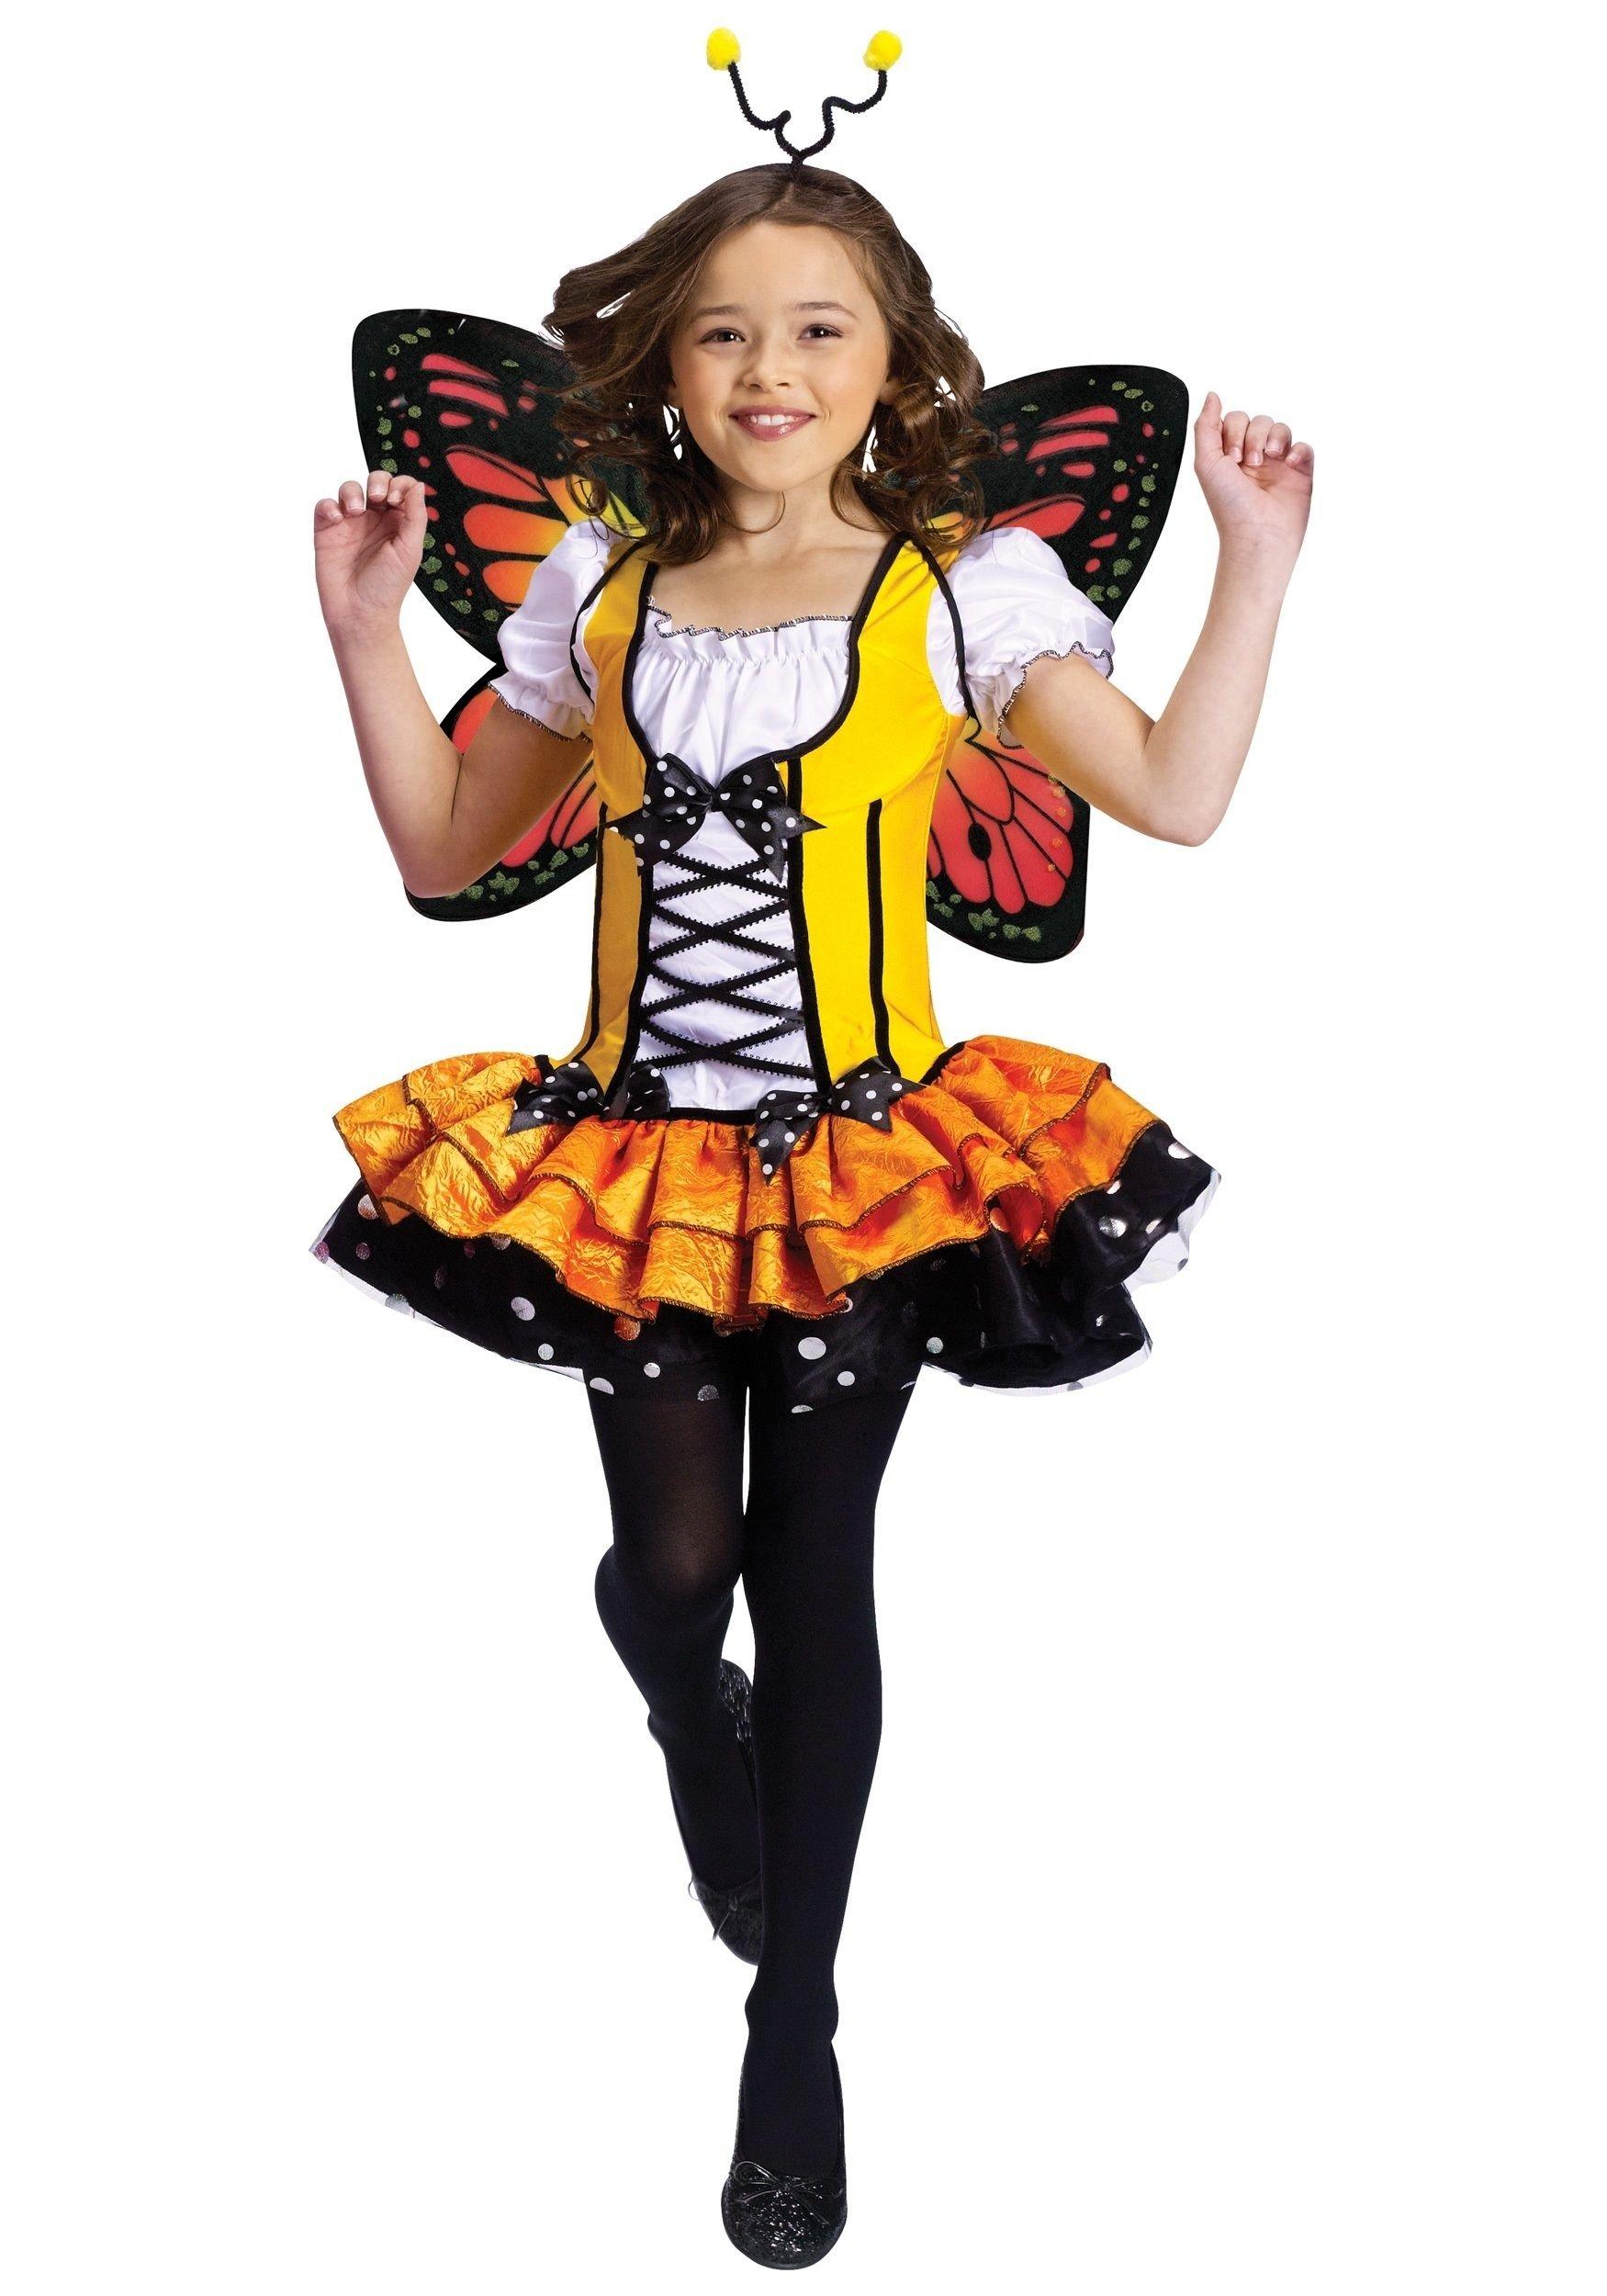 10 Great Kids Halloween Costume Ideas 2013 kids butterfly princess costume halloween fall pinterest 2020